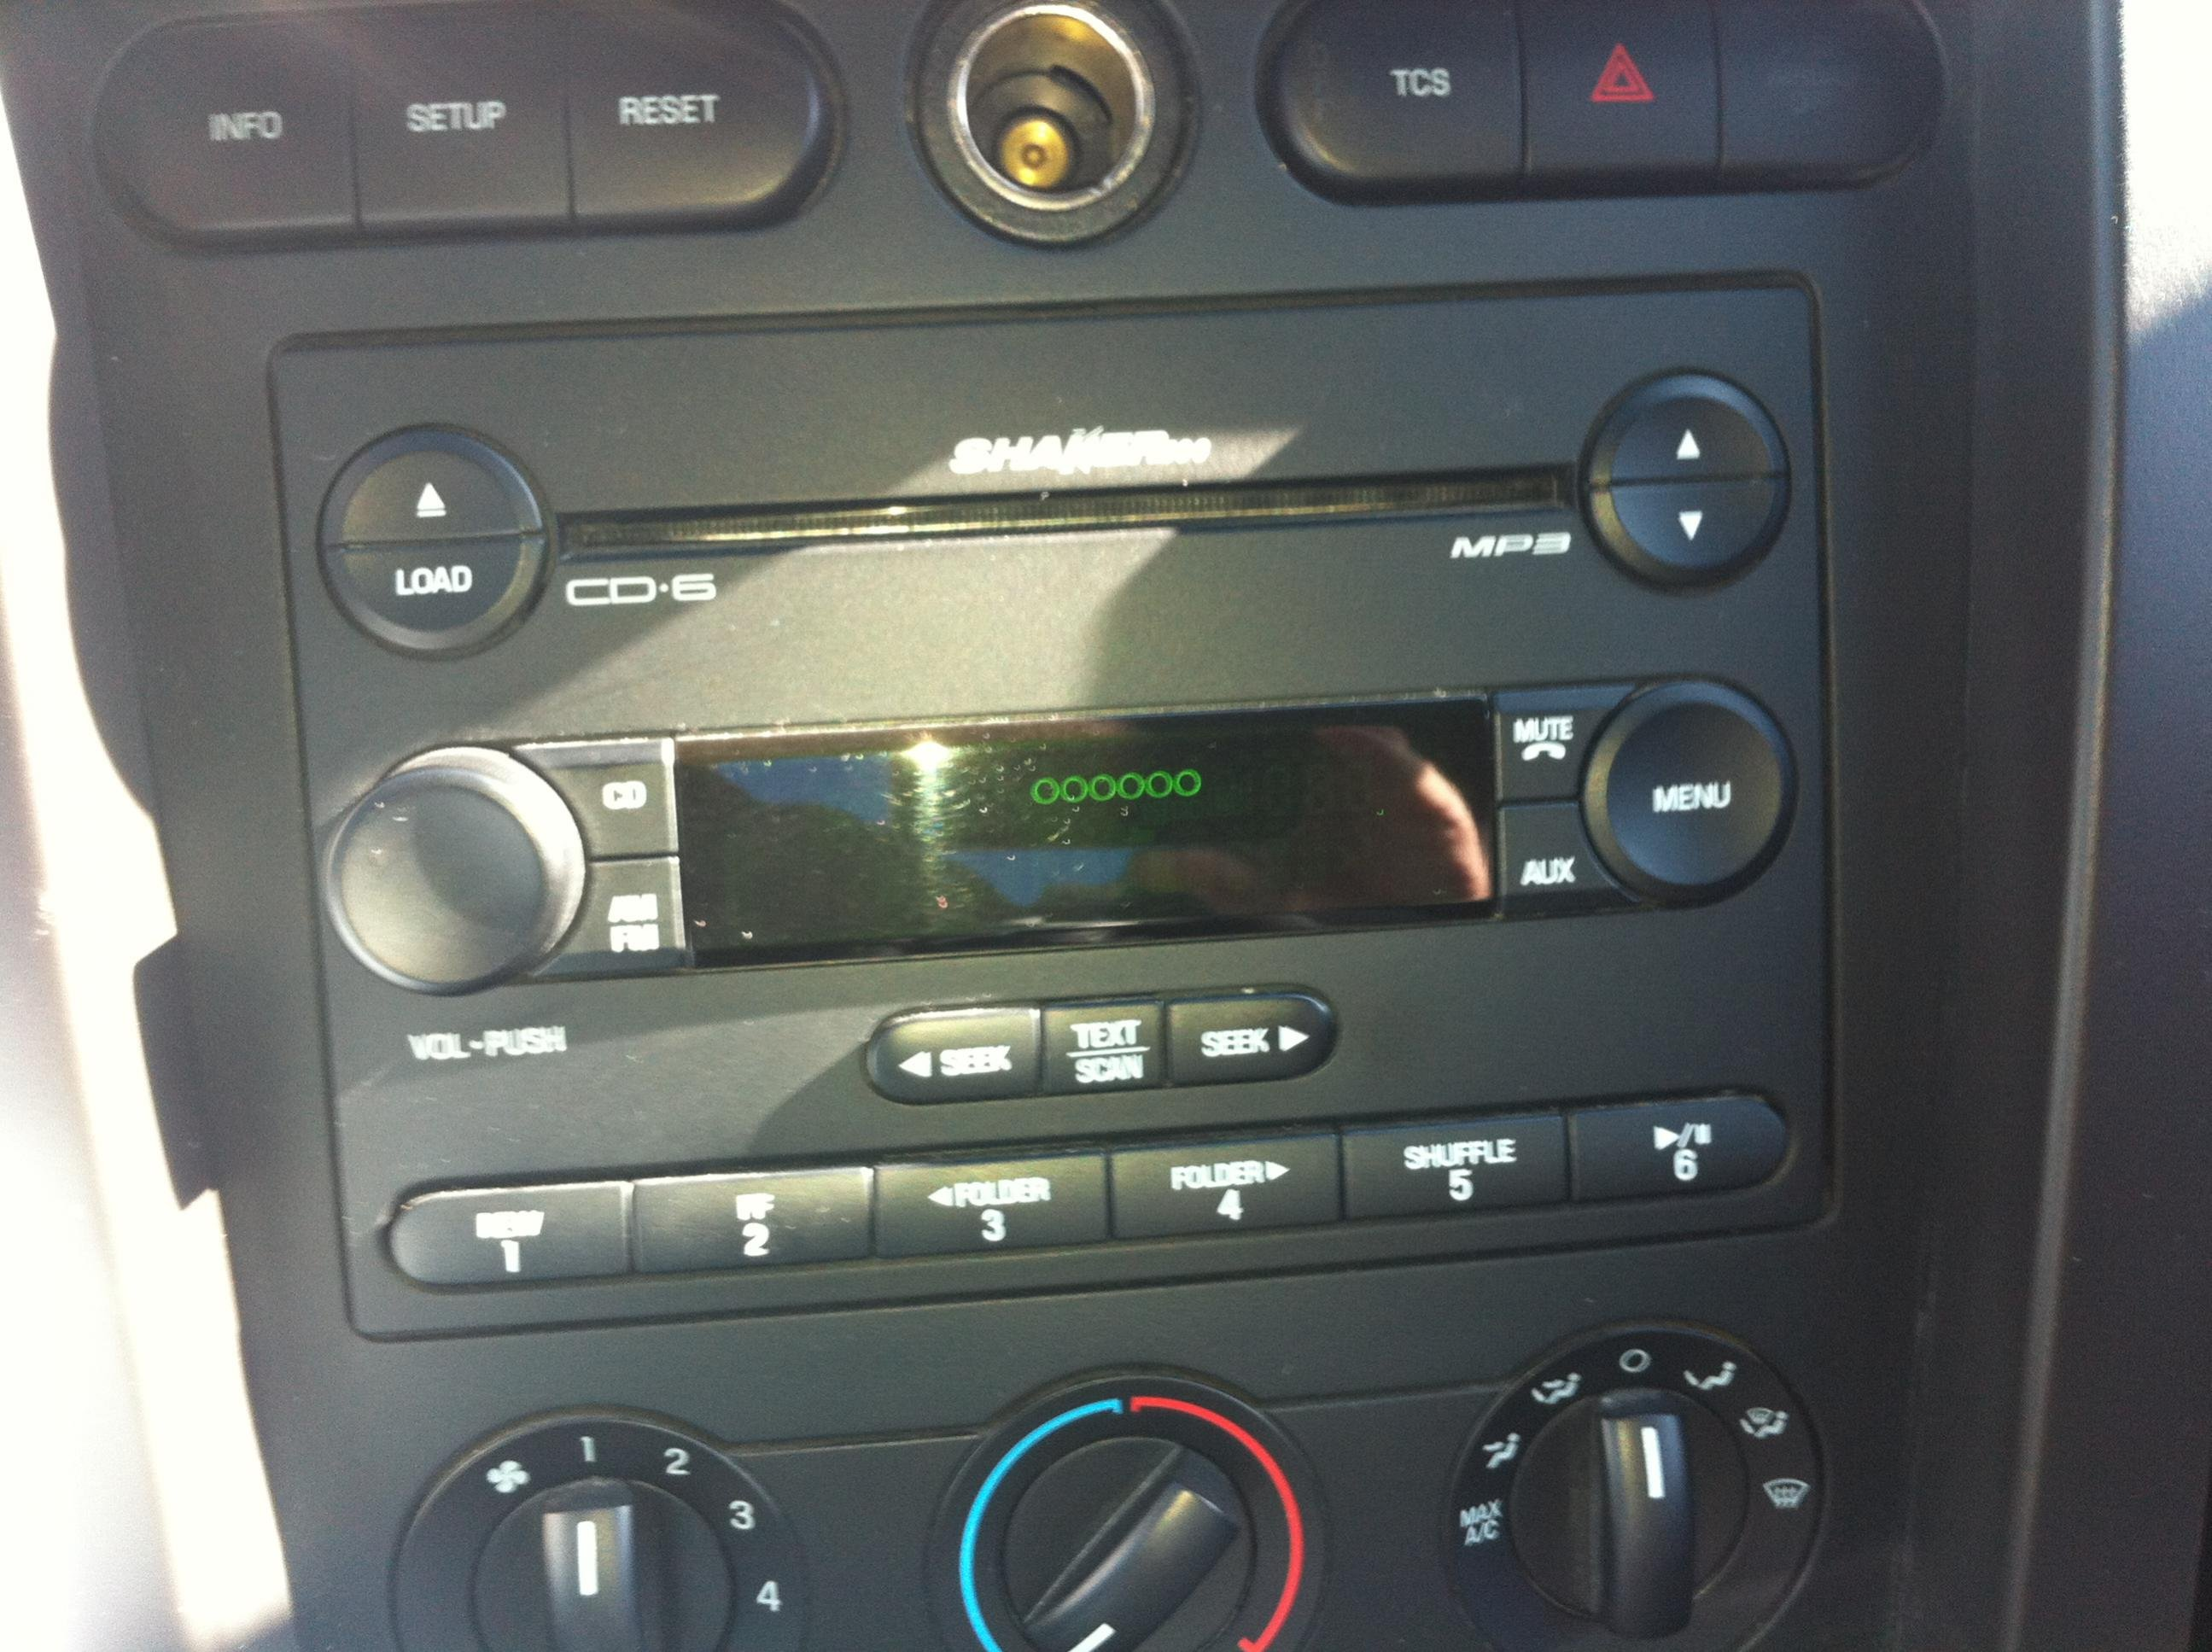 similiar mustang shaker 500 radio keywords 2005 mustang shaker 500 stereo 2005 mustang shaker 500 stereo